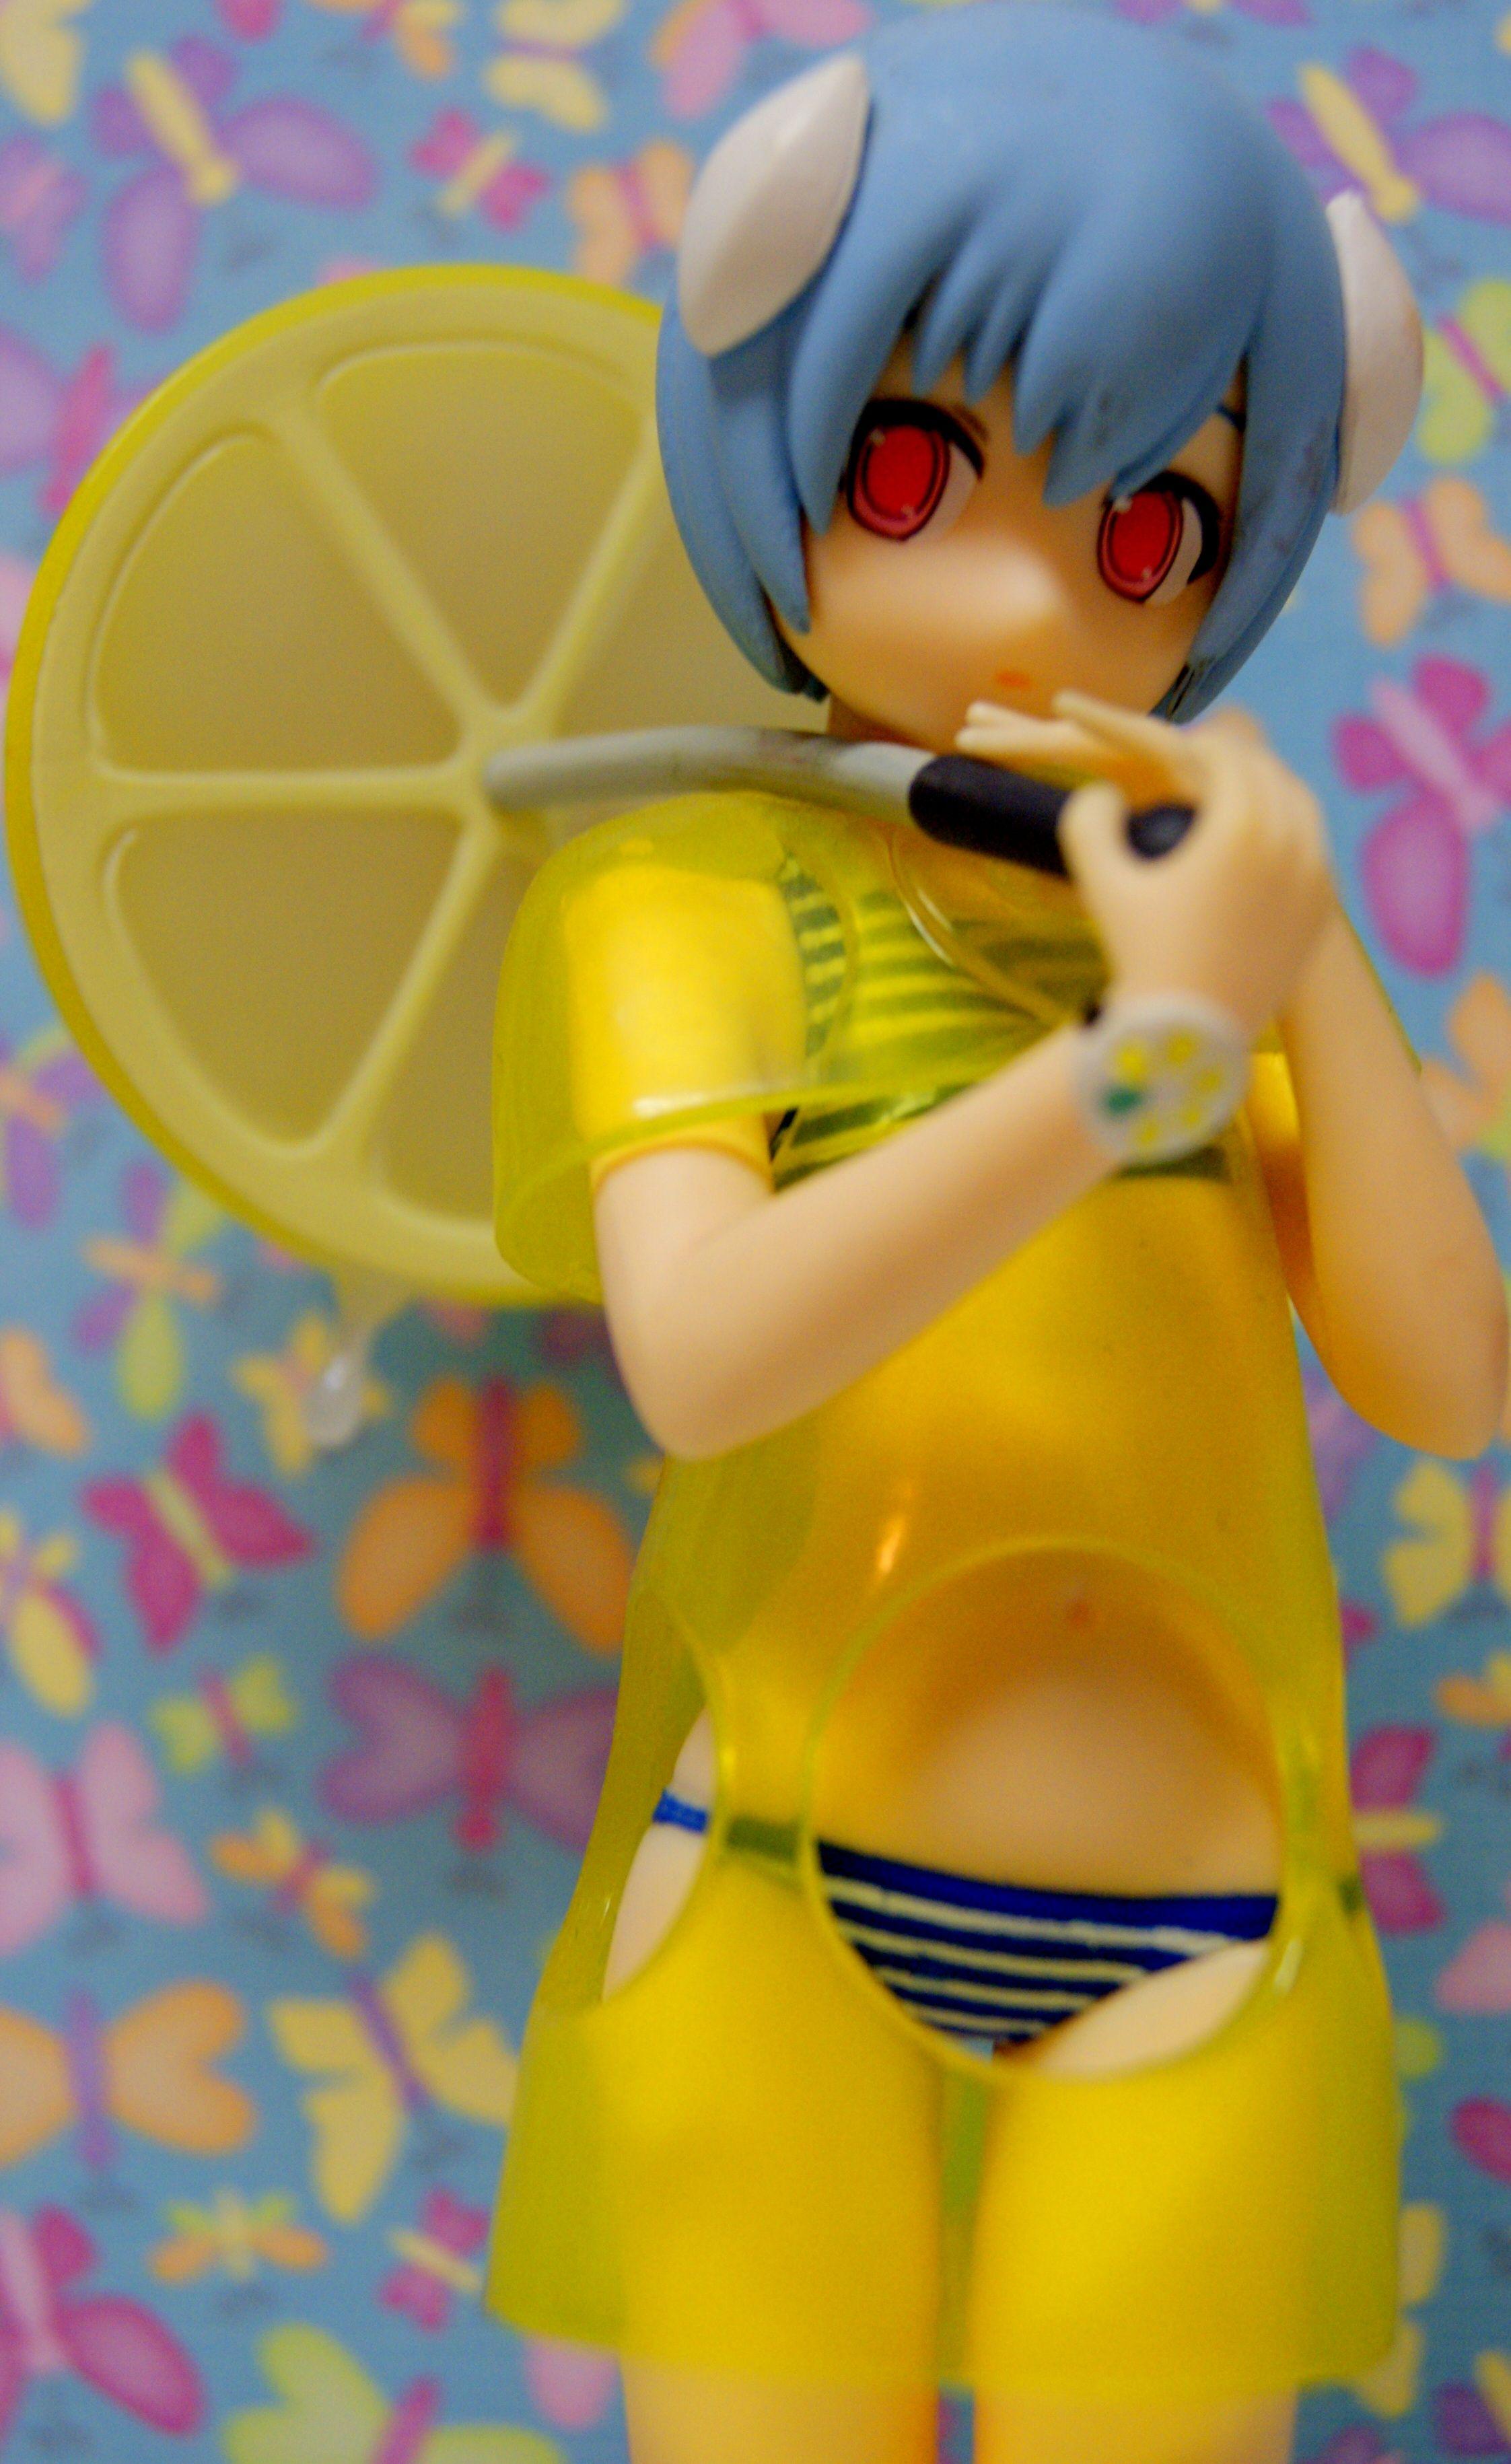 From neon genesis evangelion anime figures neon genesis